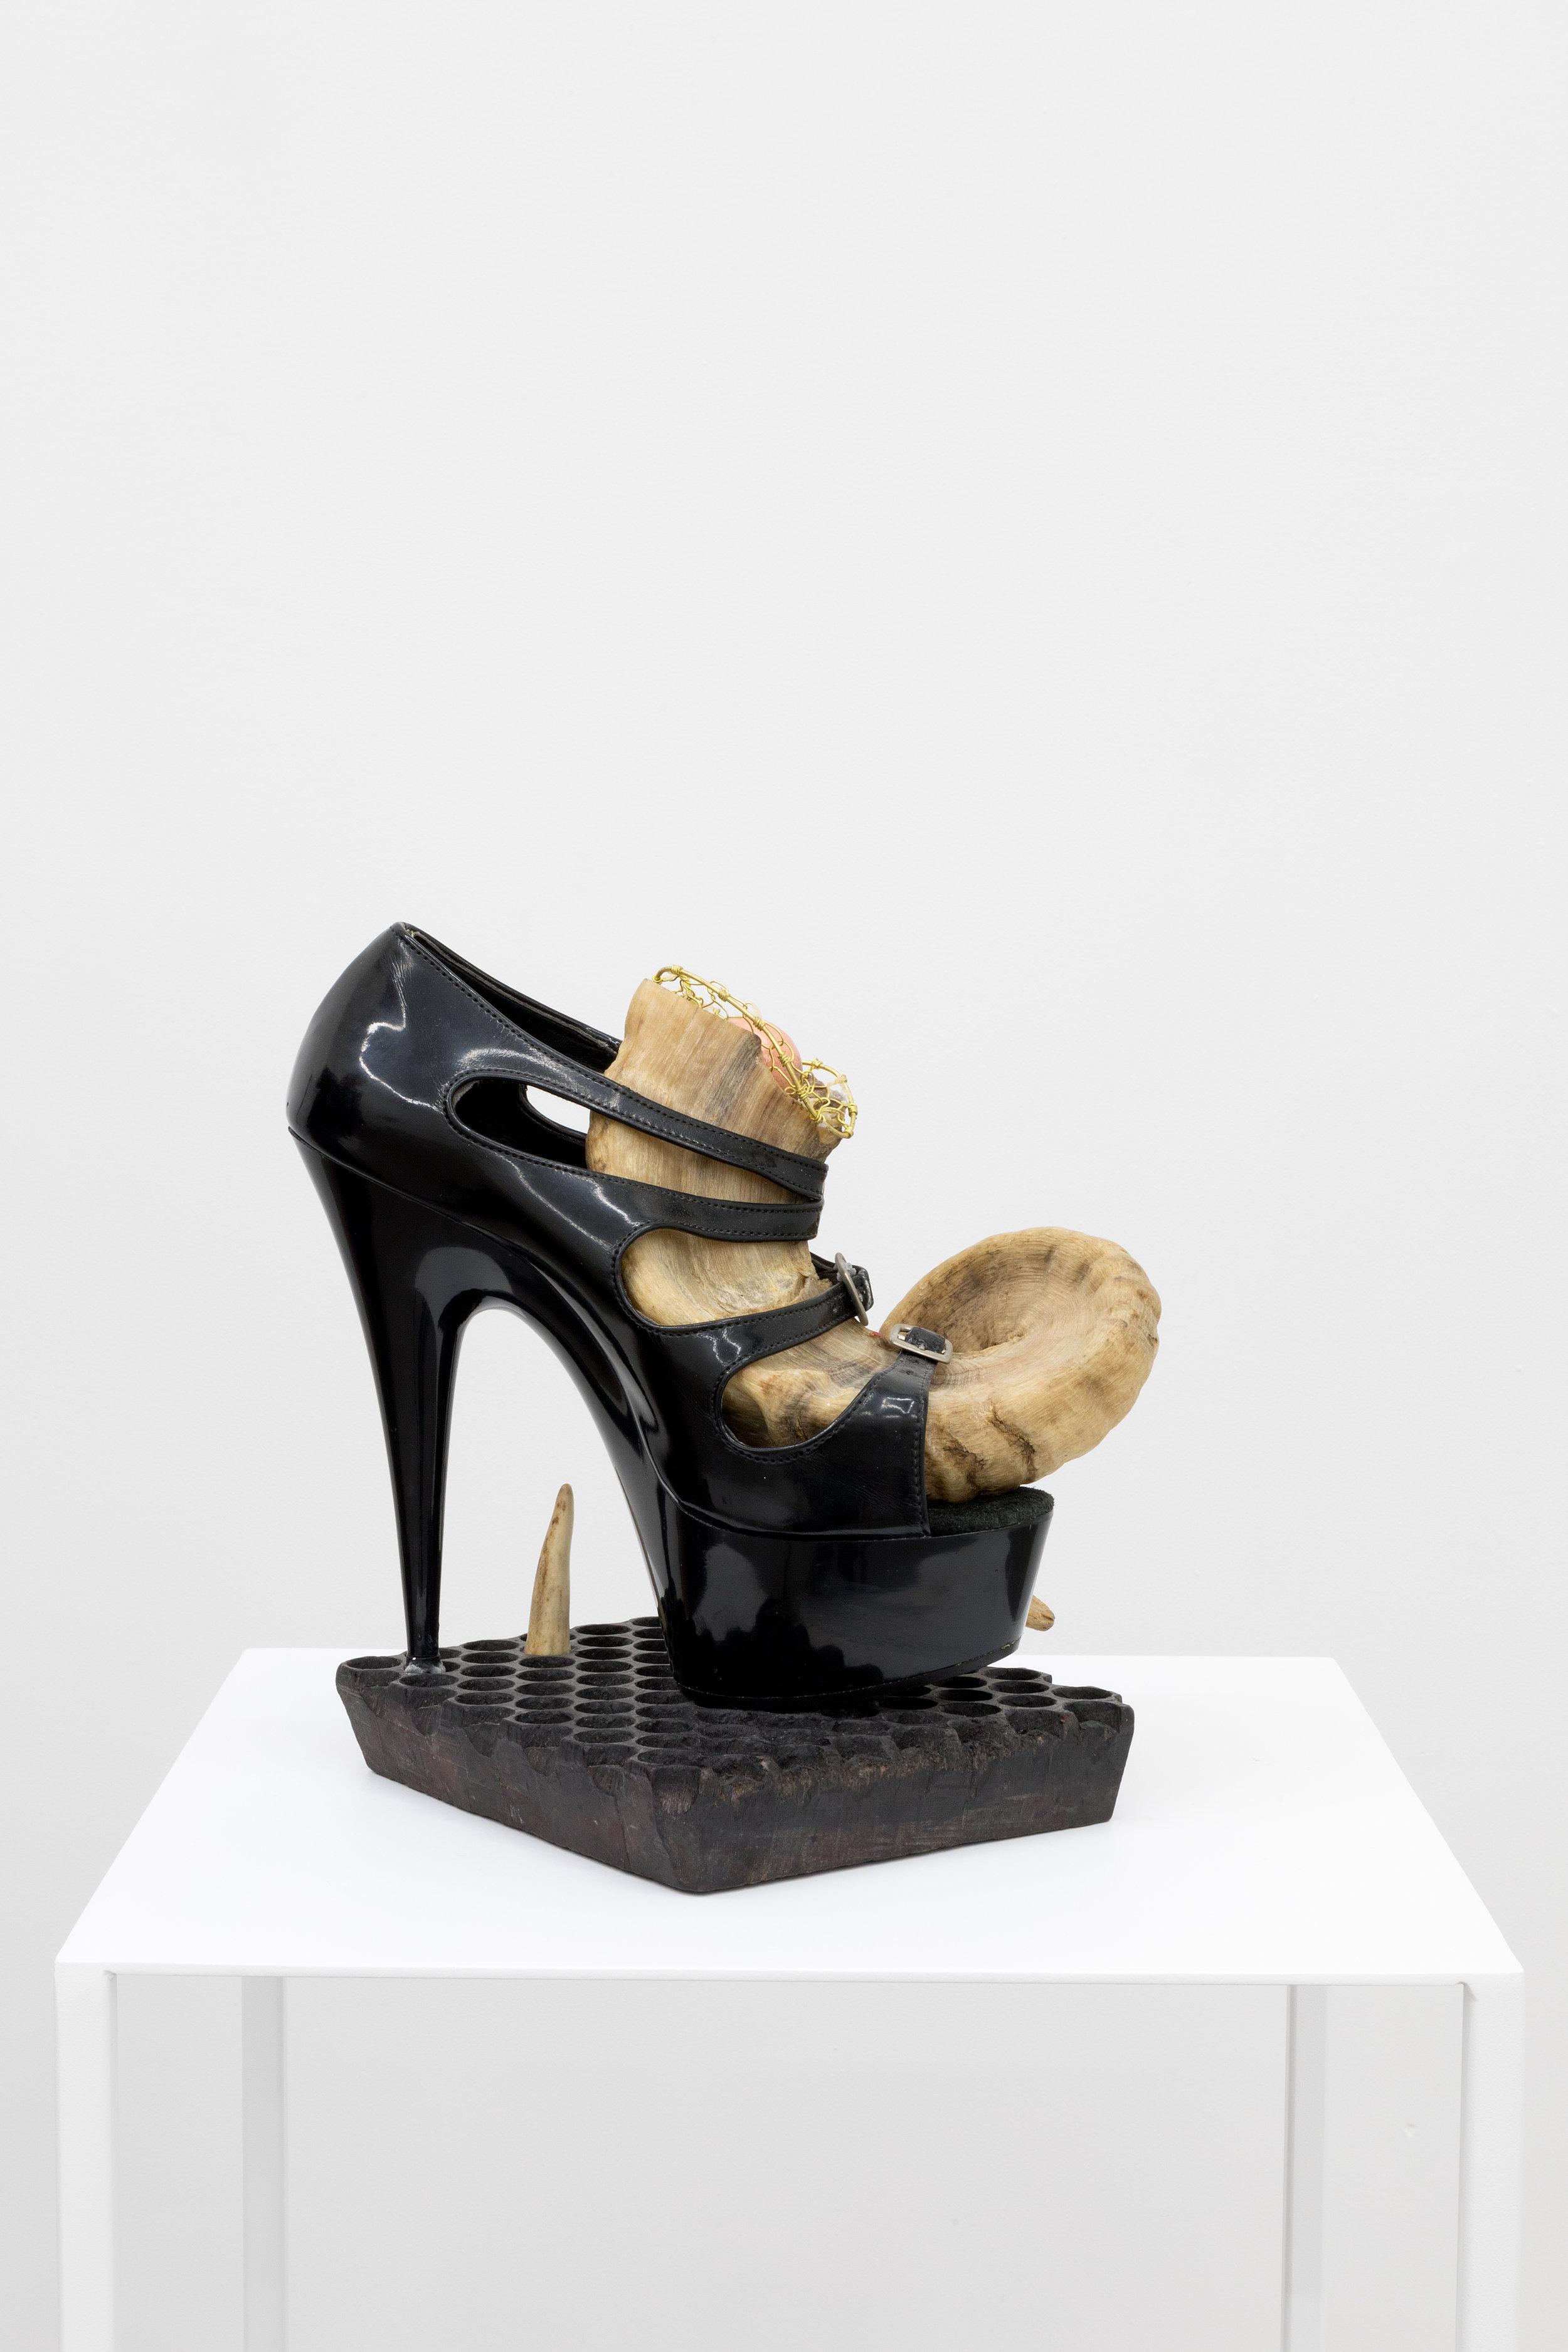 Genesis BREYER P-ORRIDGE,  Shoe Horn #3 , 2014, Ram horn, shoe worn by Genesis as Lady Sarah (he/r dominatrix persona), sting ray skin, ermine fur, bone, Nepalese fabric-printing square, brass netting, copper ball, 9 x 9 x 8 in